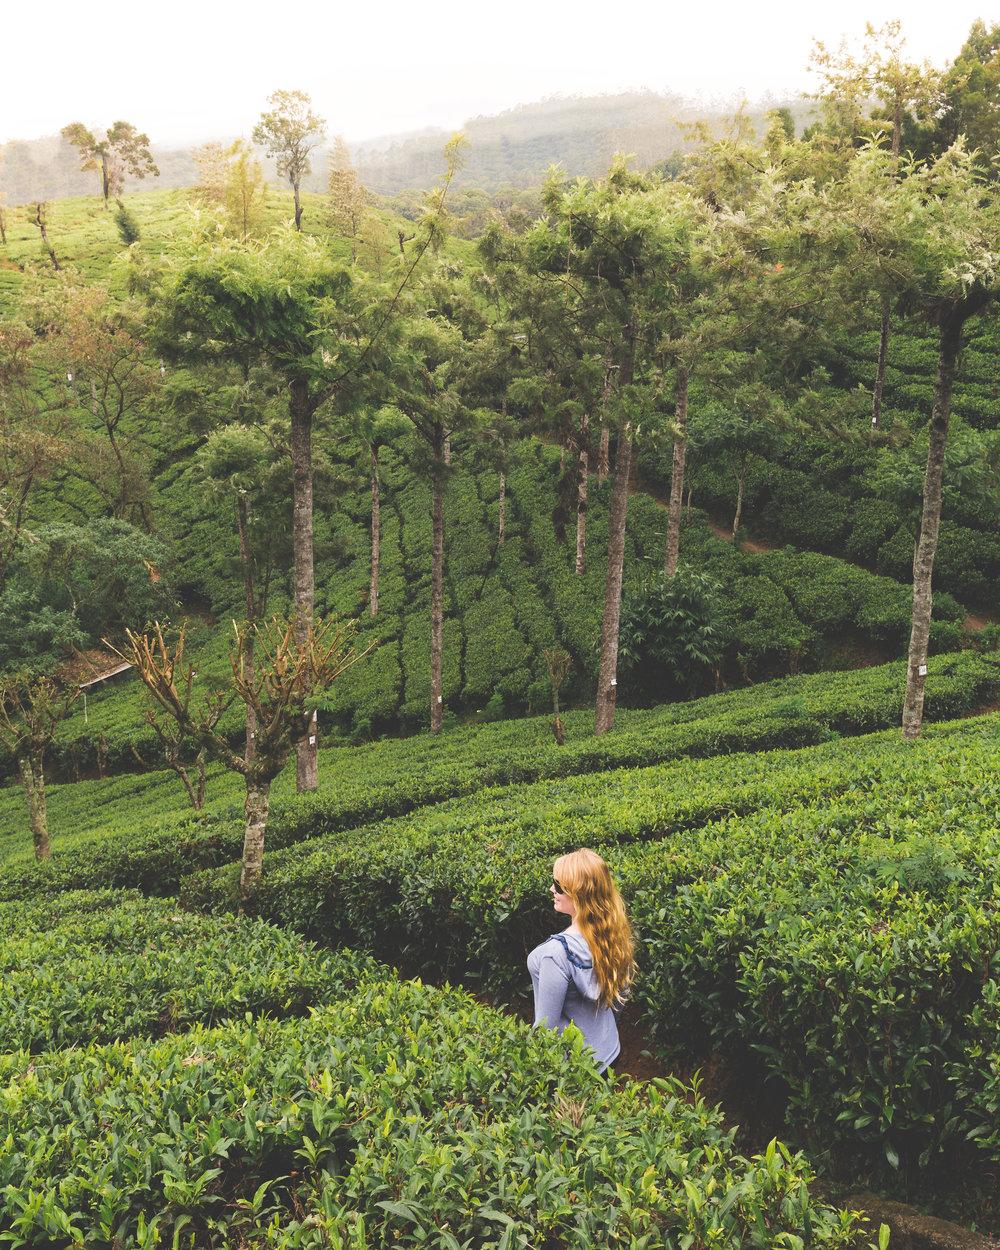 Sri Lanka Itinerary - Nuwara Eliya